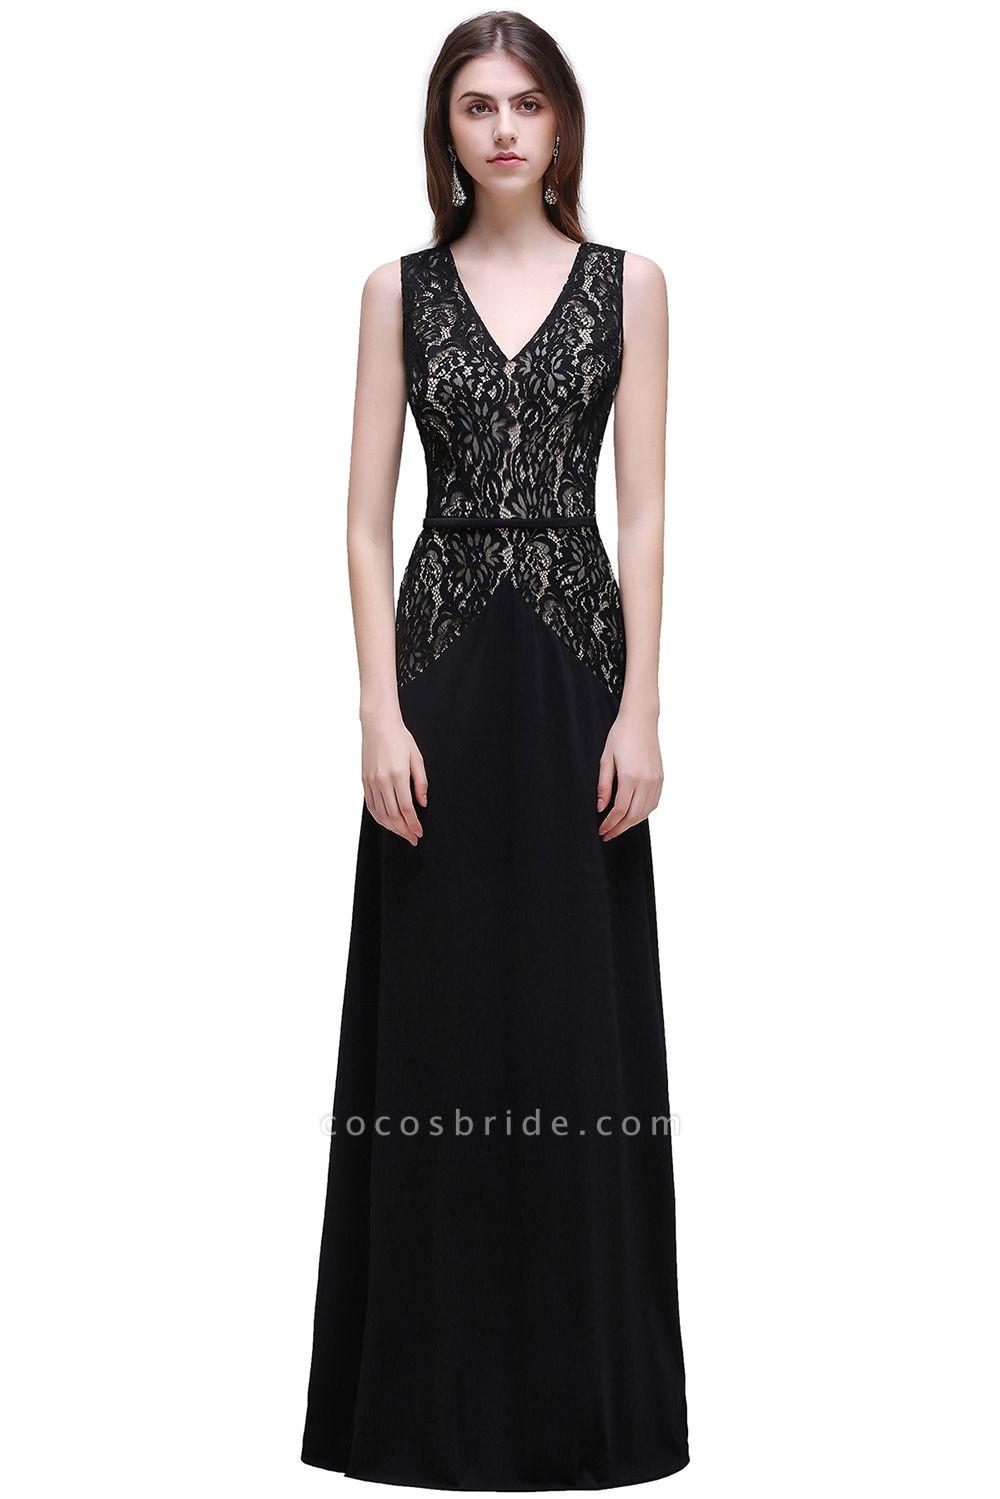 BRYANNA   A-line V-Neck Long Lace Black Prom Dresses with Sash